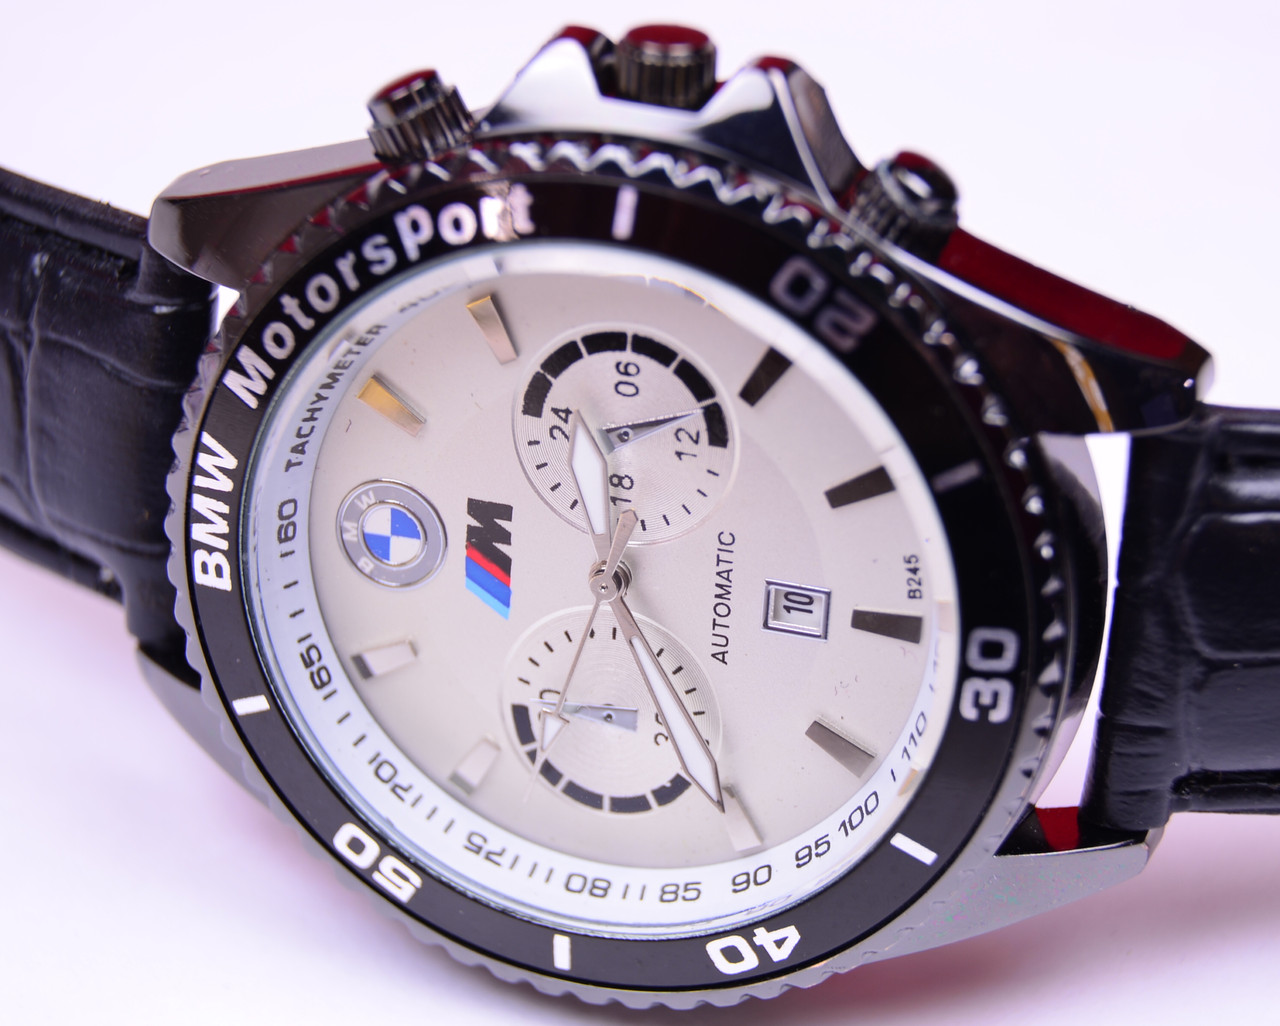 e203b52a Мужские наручные часы BMW (B243) кварц календарь белый циферблат, цена 219  грн., купить в Николаеве — Prom.ua (ID#533248779)